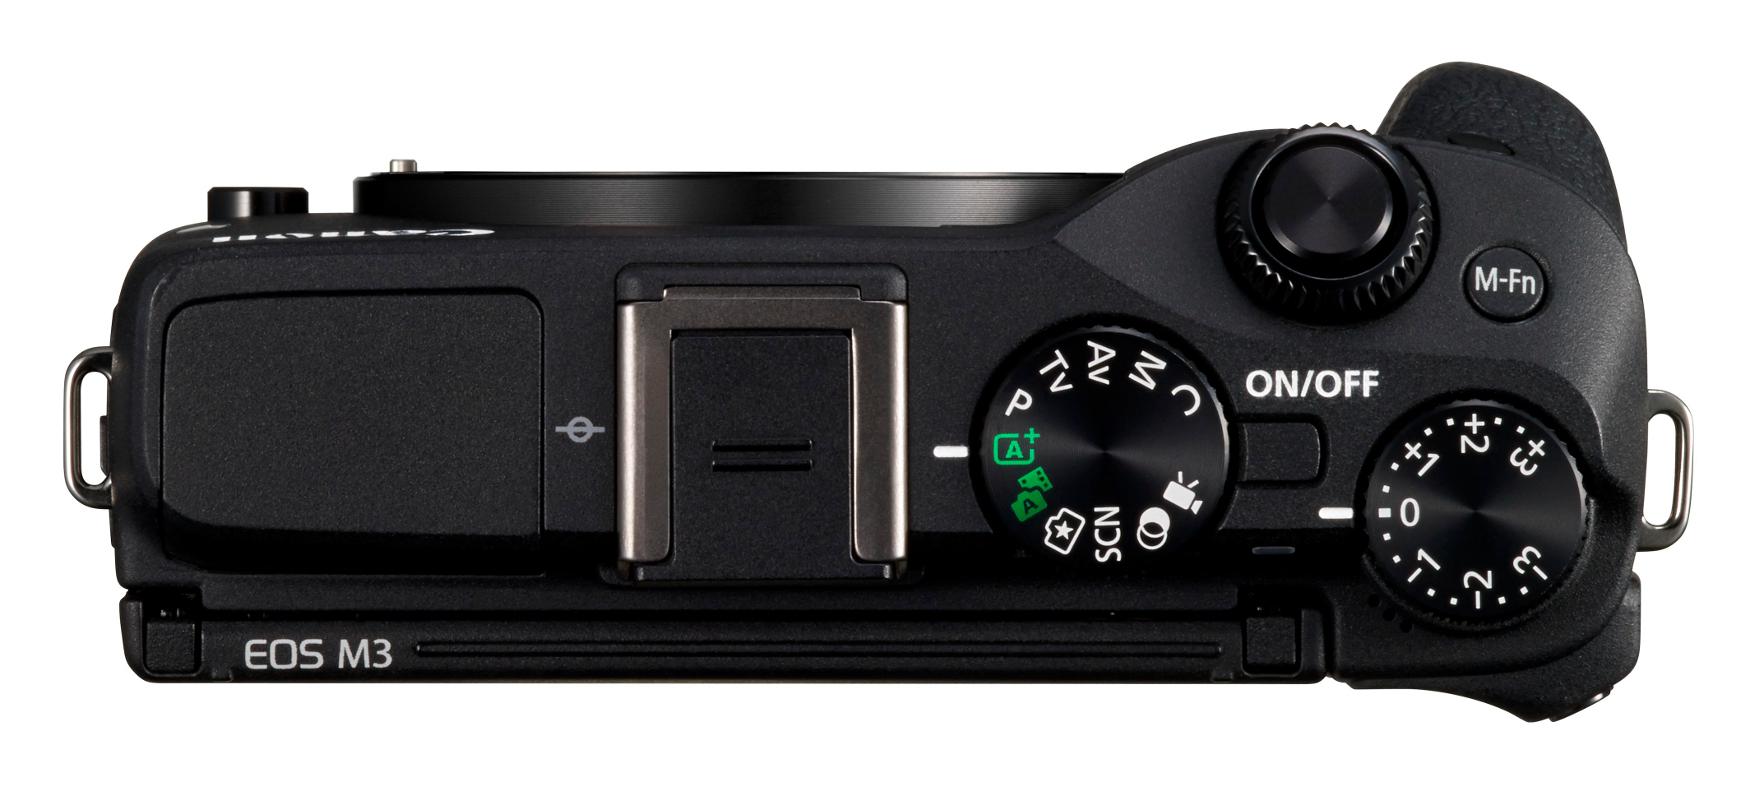 24.2MP EOS M3 DSLR Body Only in Black